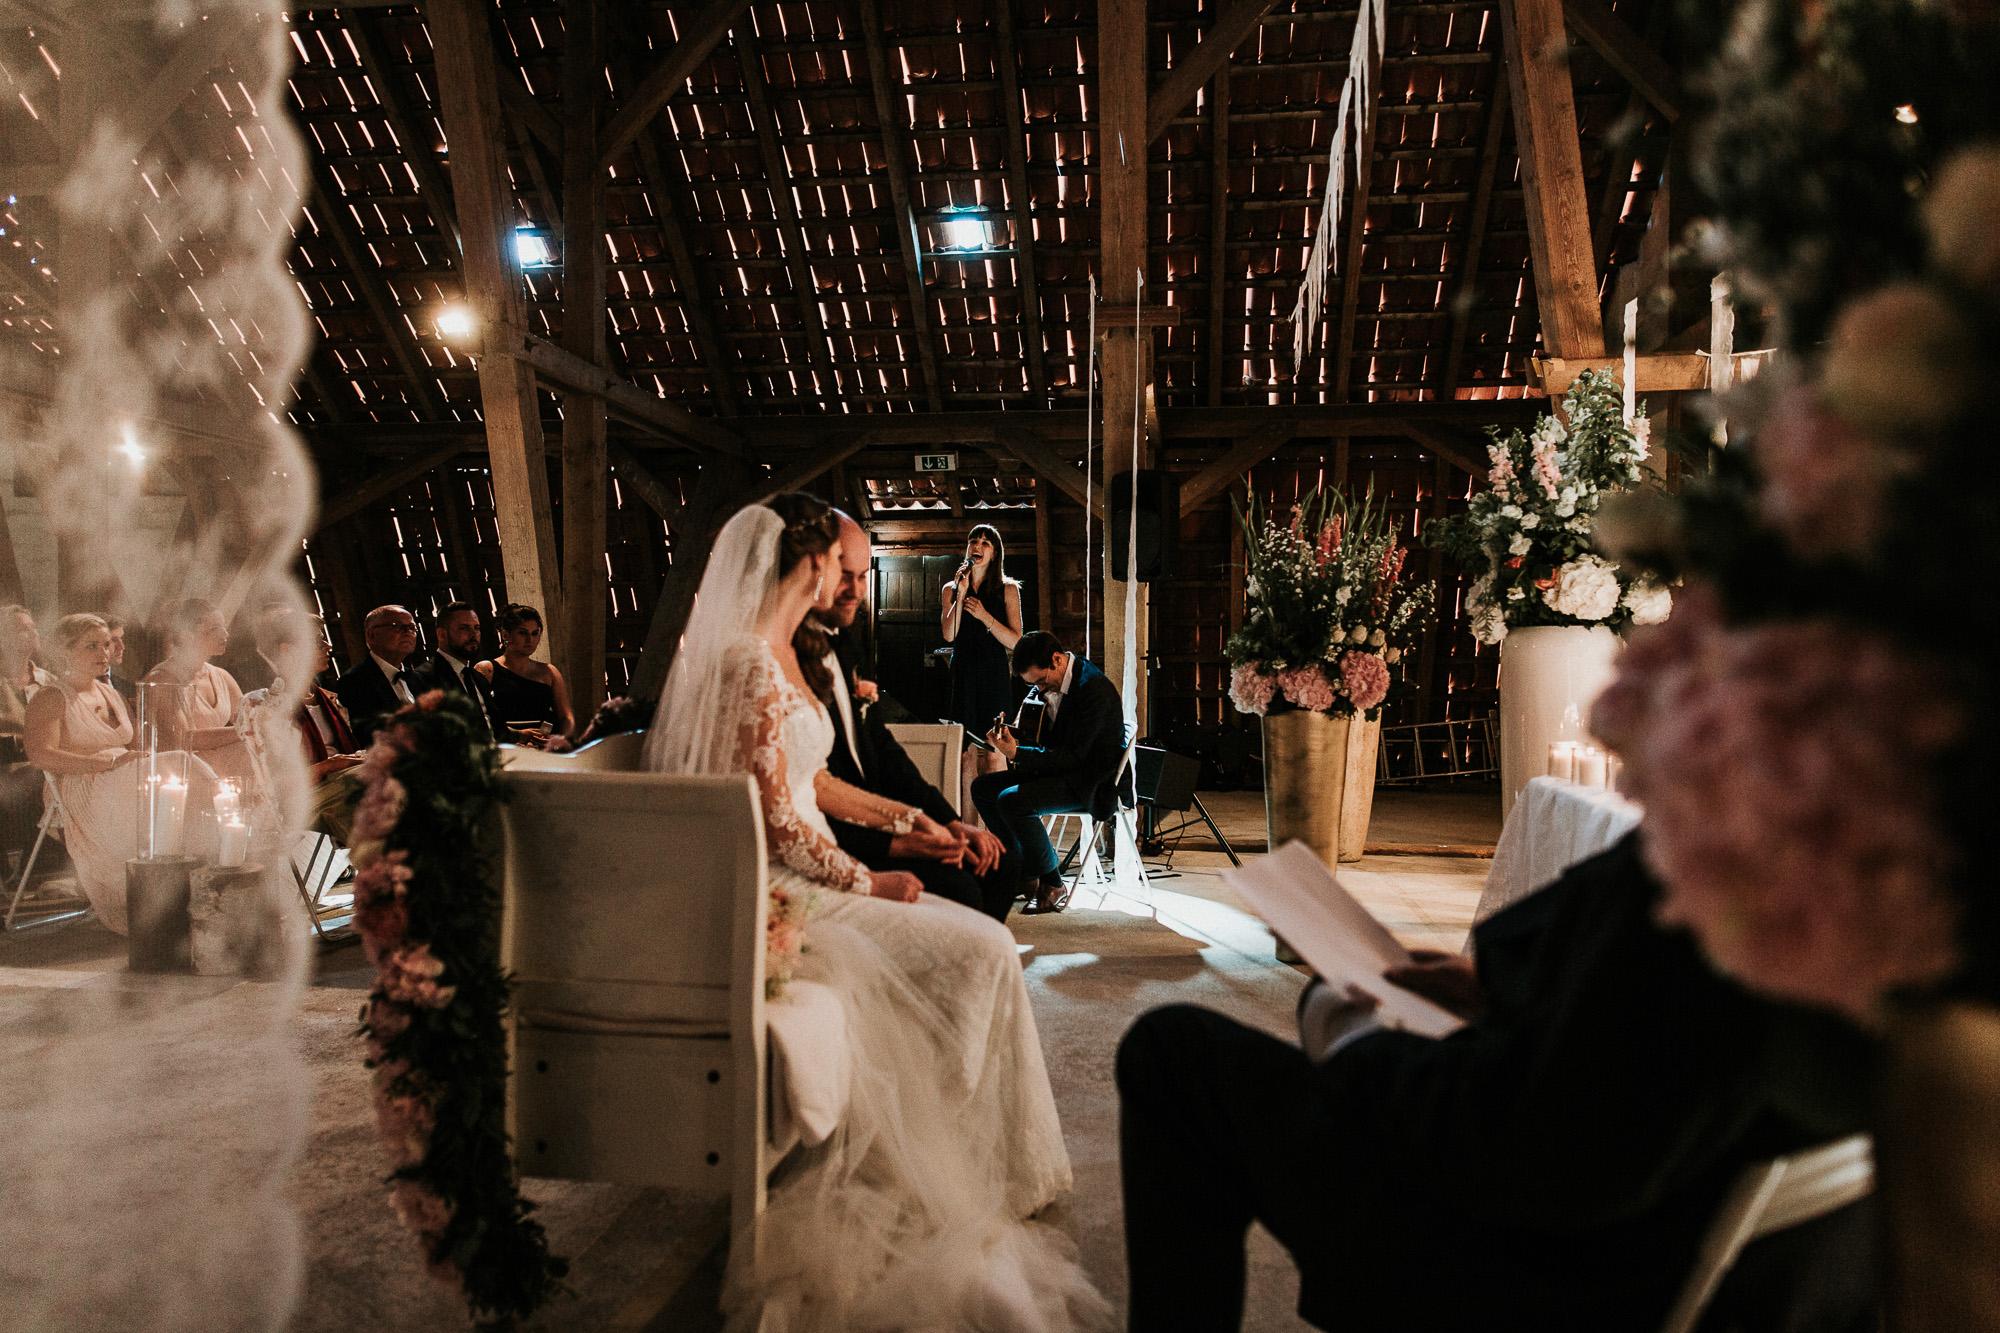 DanielaMarquardtPhotography_Hochzeitsfotograf_Düsseldorf_Köln_Mallorca_Bayern_Austria_Harz_Wedding_AileenundLennart_Weddingphotographer_Ibiza_Tuskany_Italien_Toskana_Portugal_Lissabon124